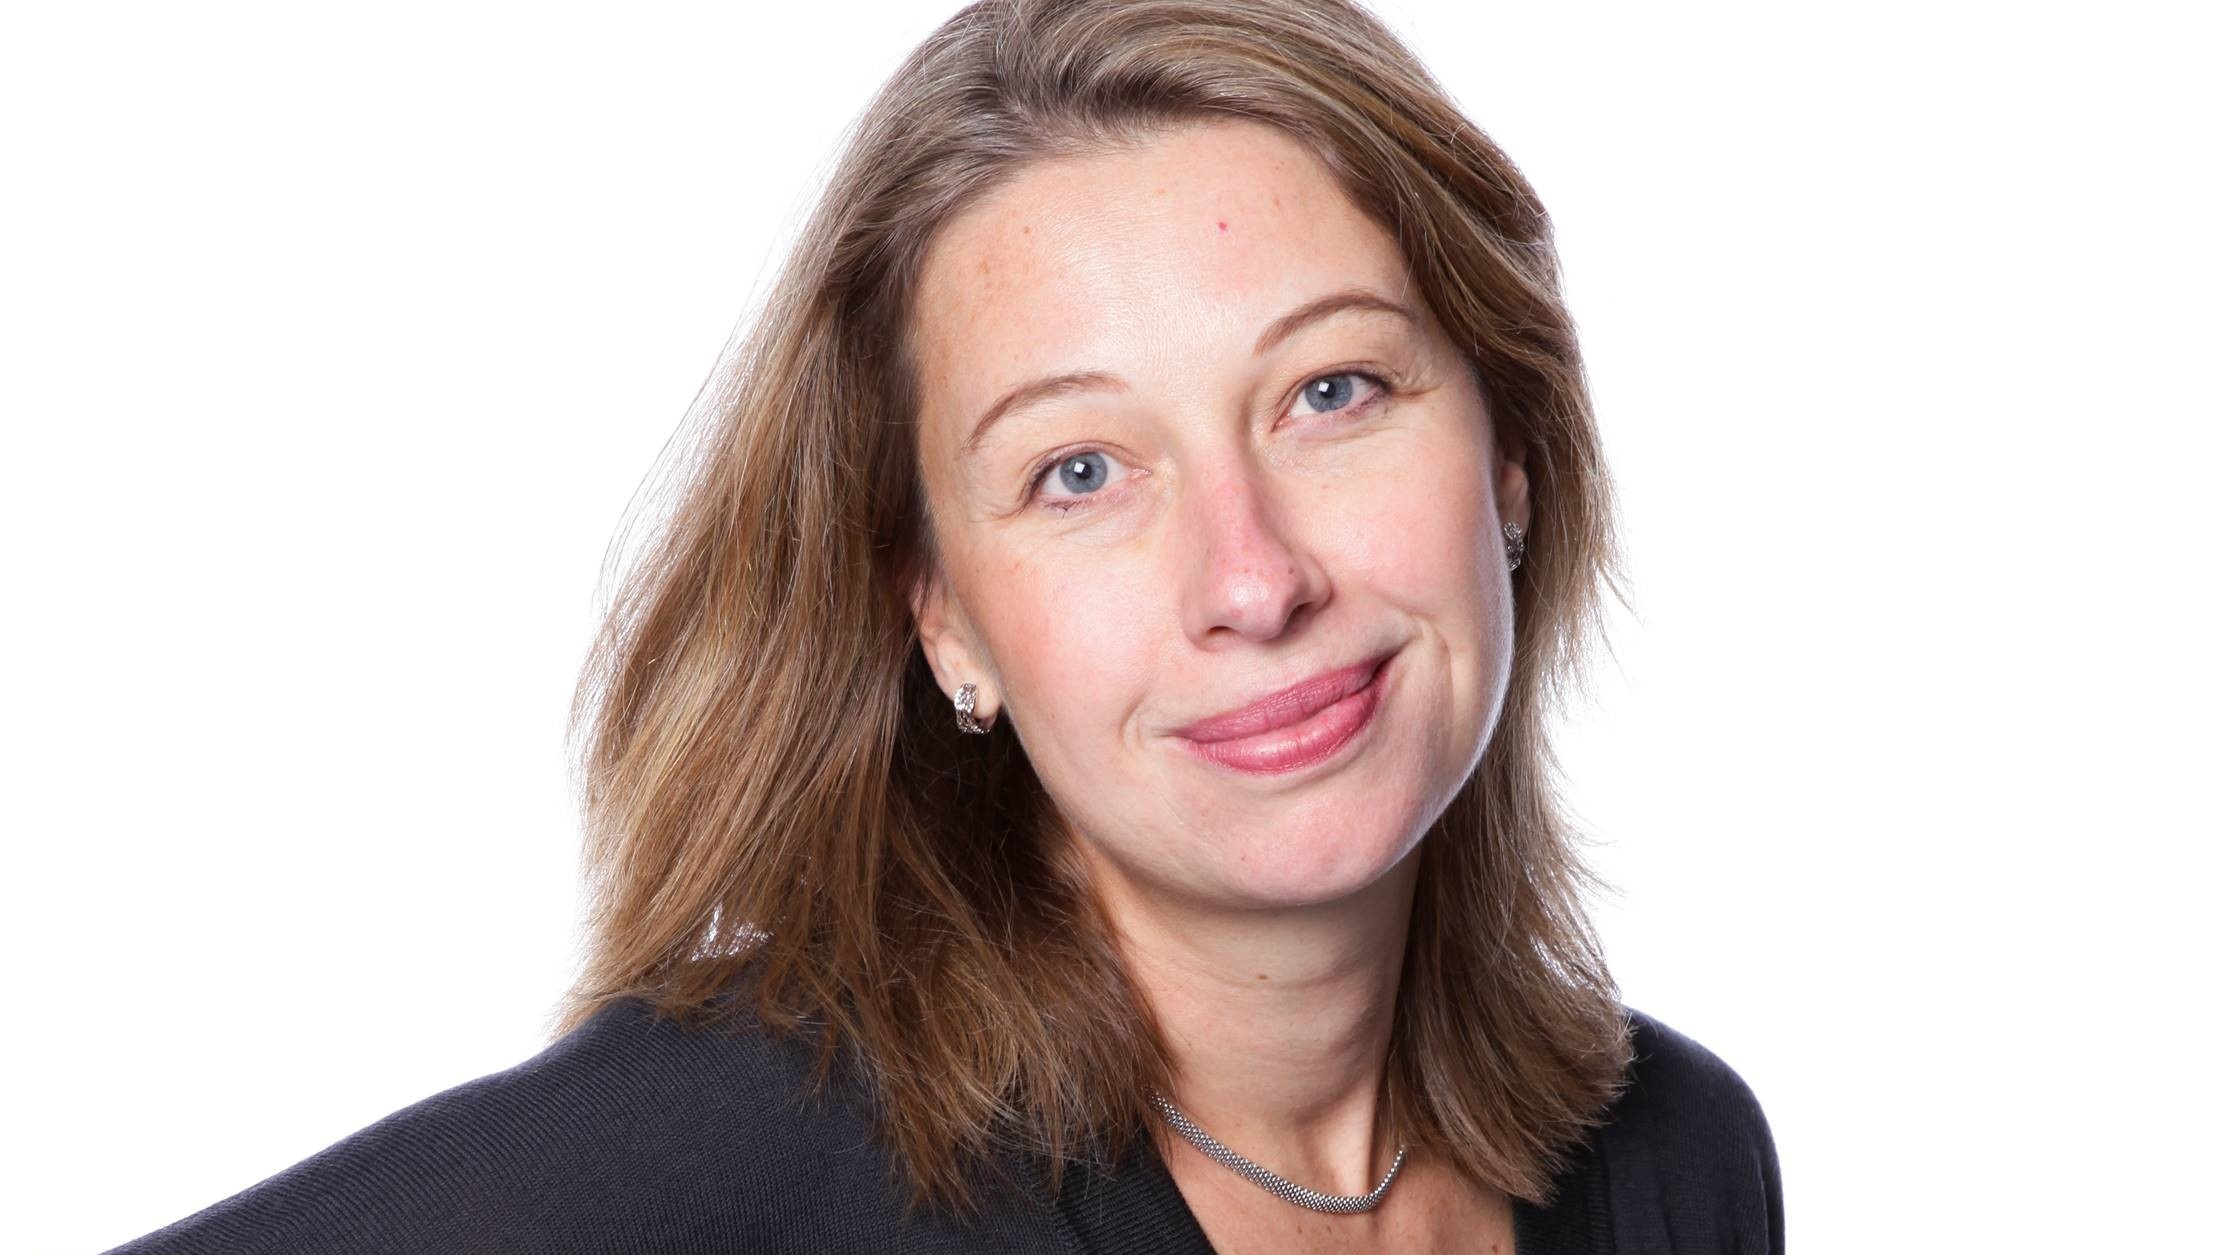 Gjesteforedrag med Silvija Seres, matematiker og teknologiinvestor